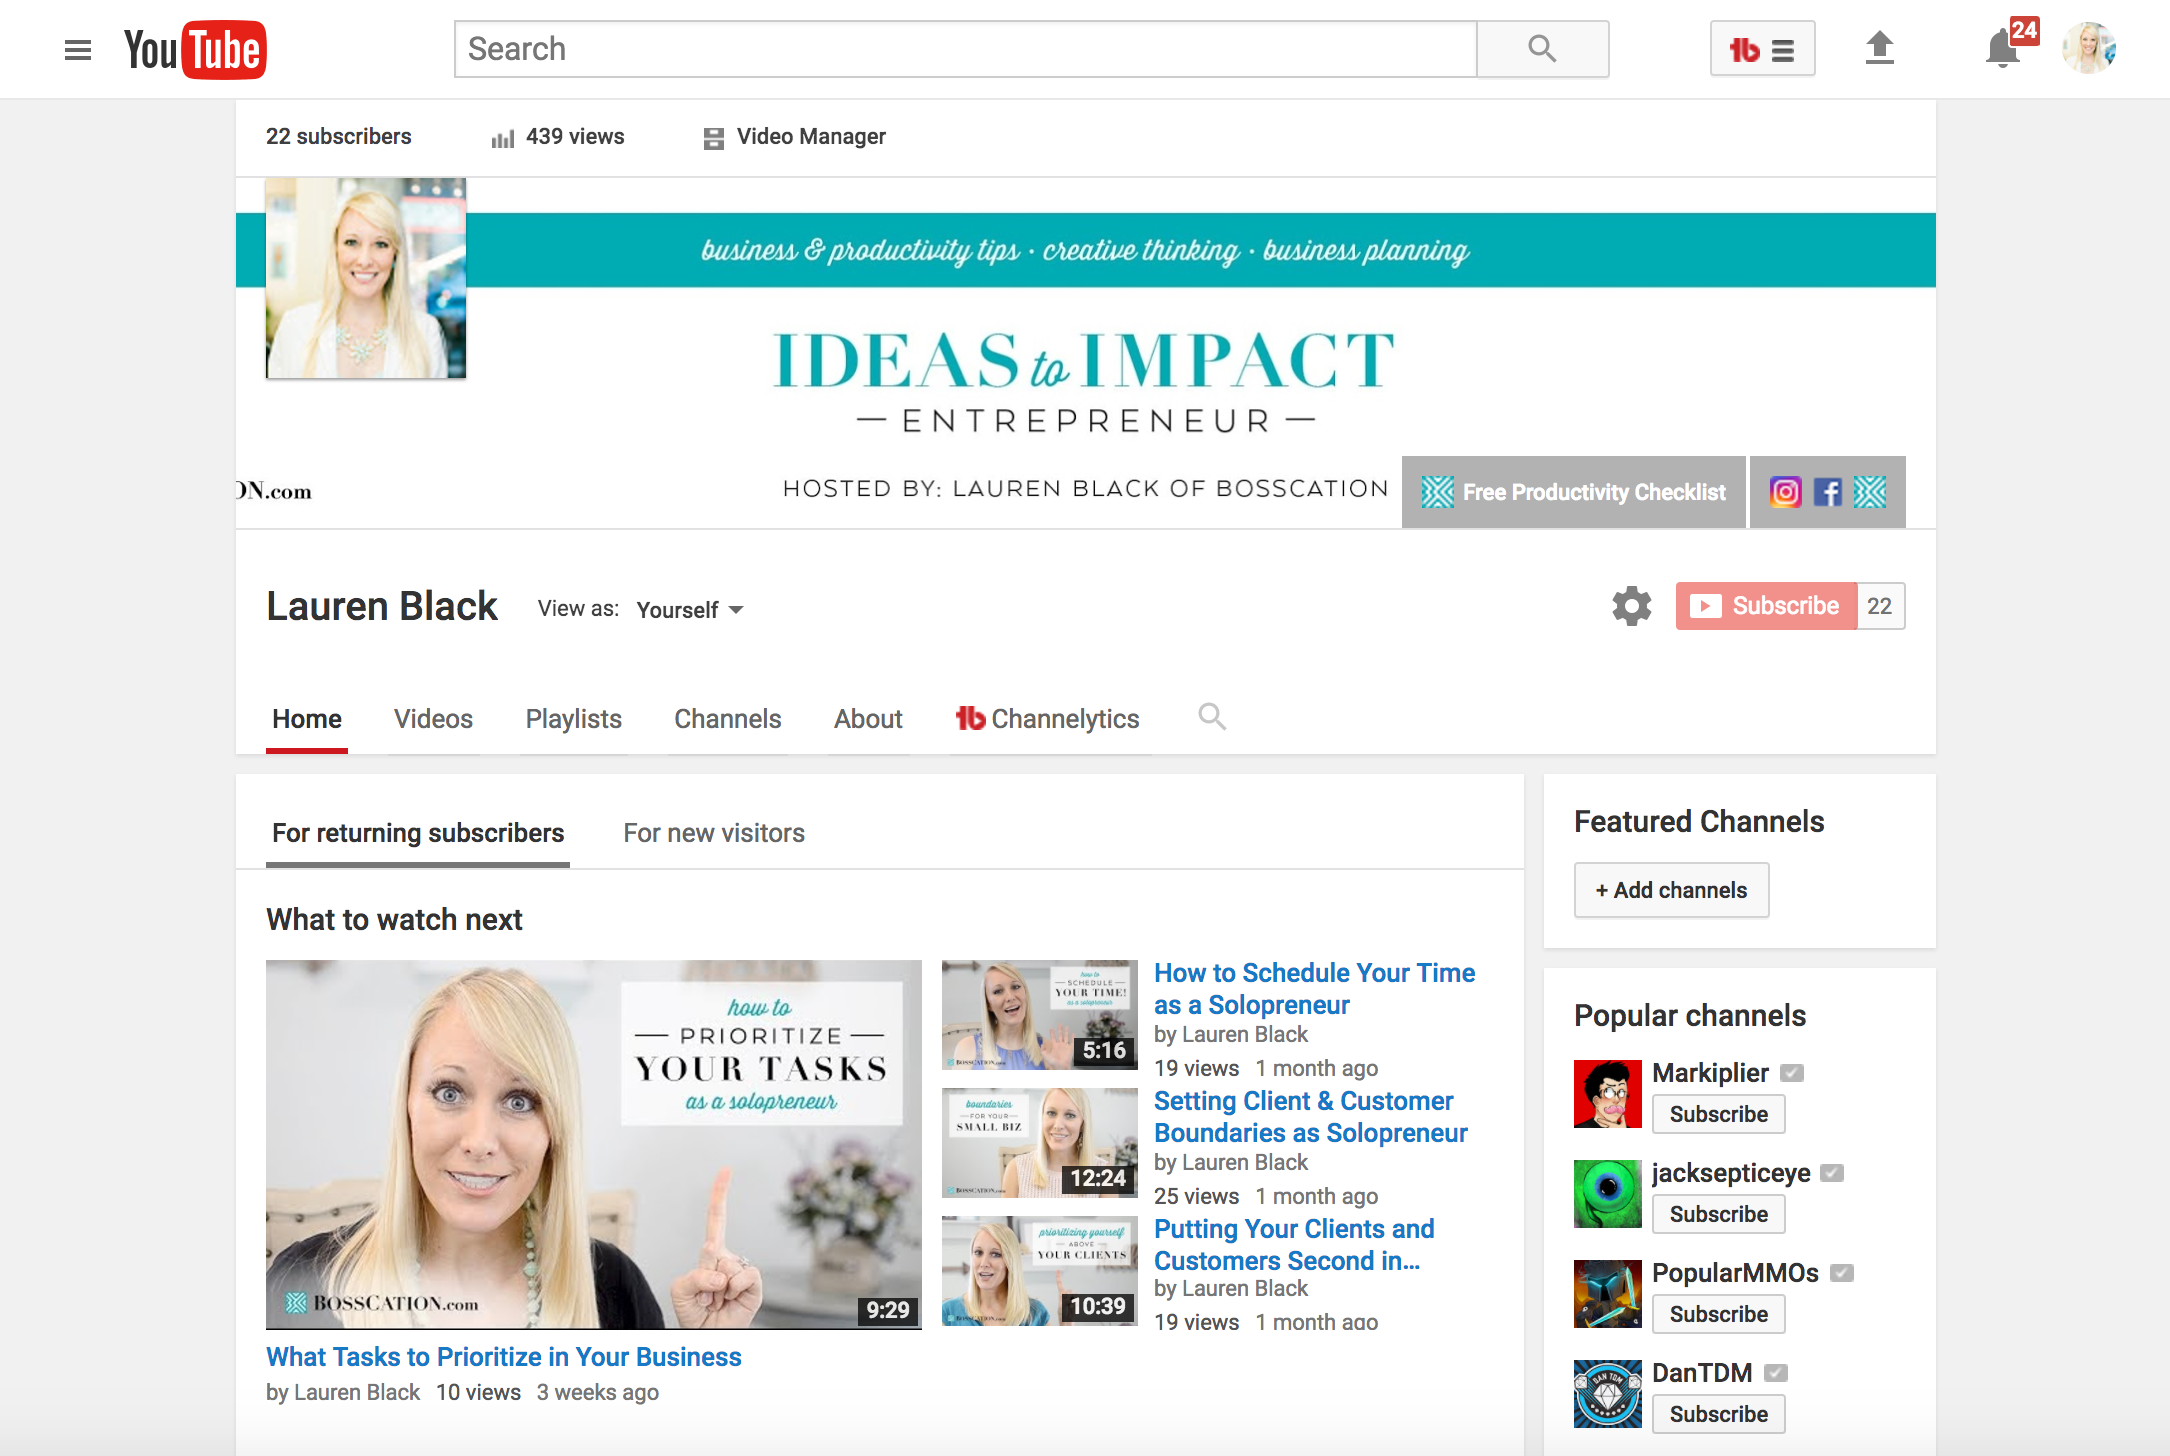 Lauren Black on YouTube — Ideas to Impact Entrepreneur